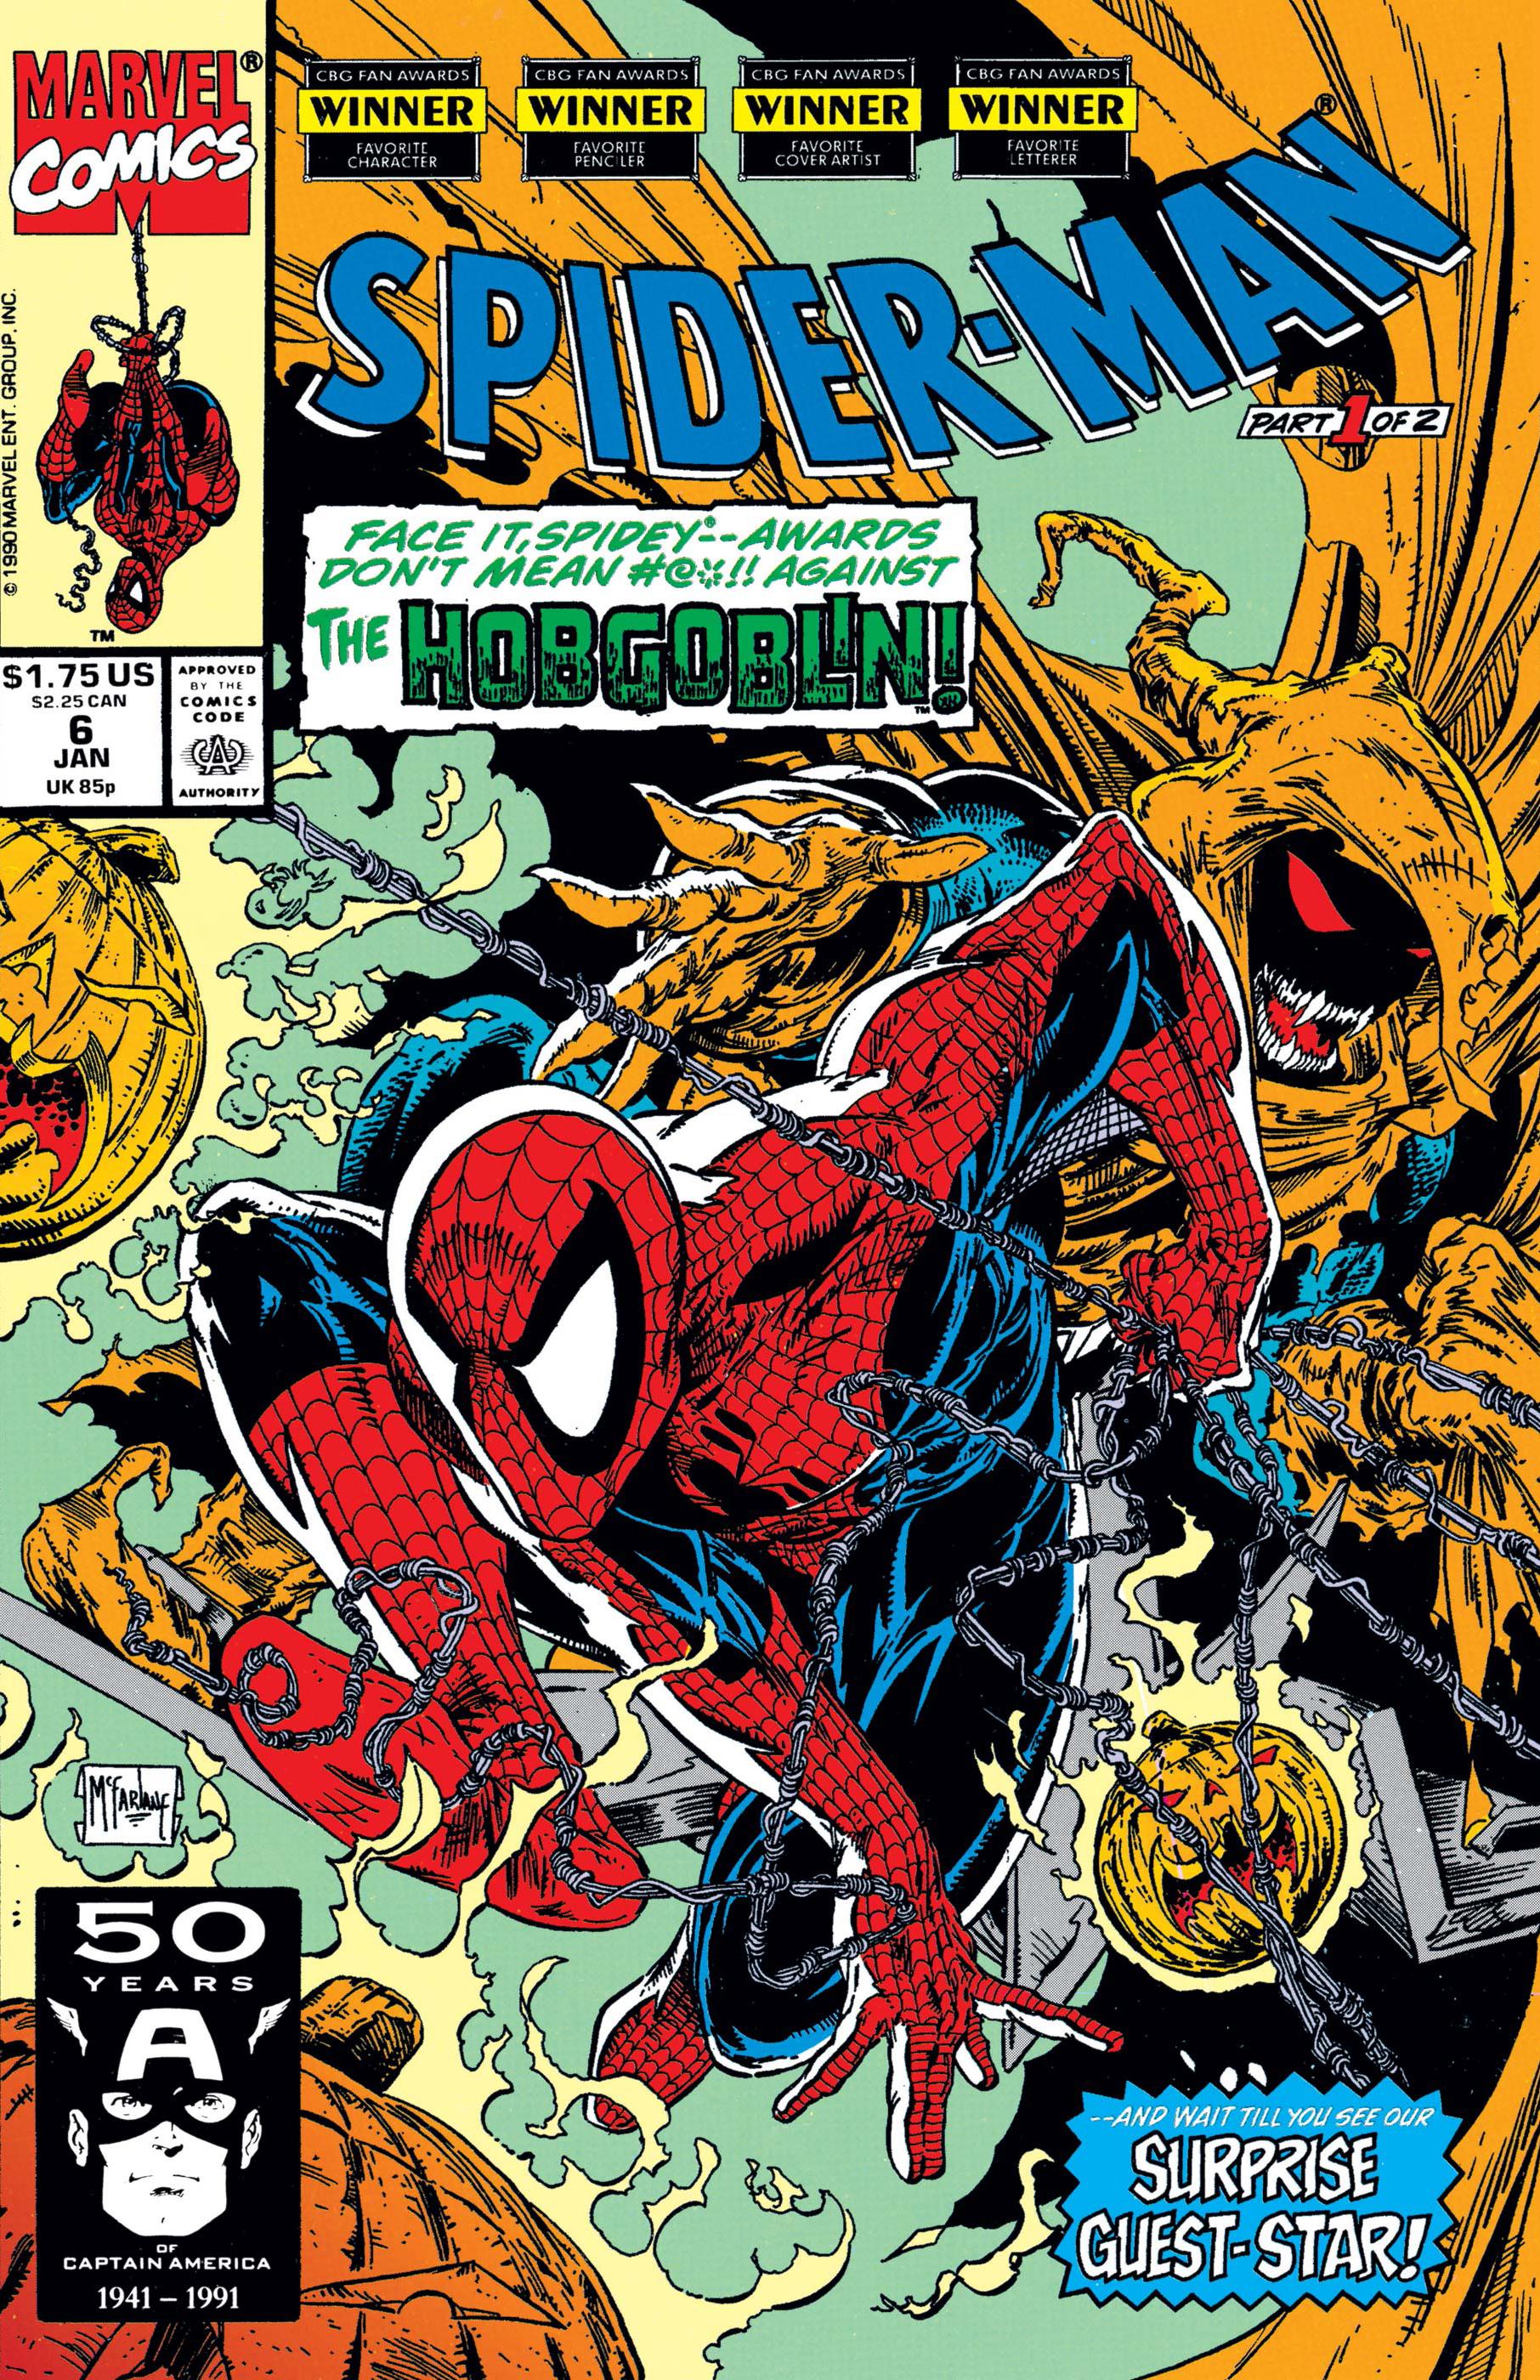 Spider-Man Vol 1 6 | Marvel Database | FANDOM powered by Wikia